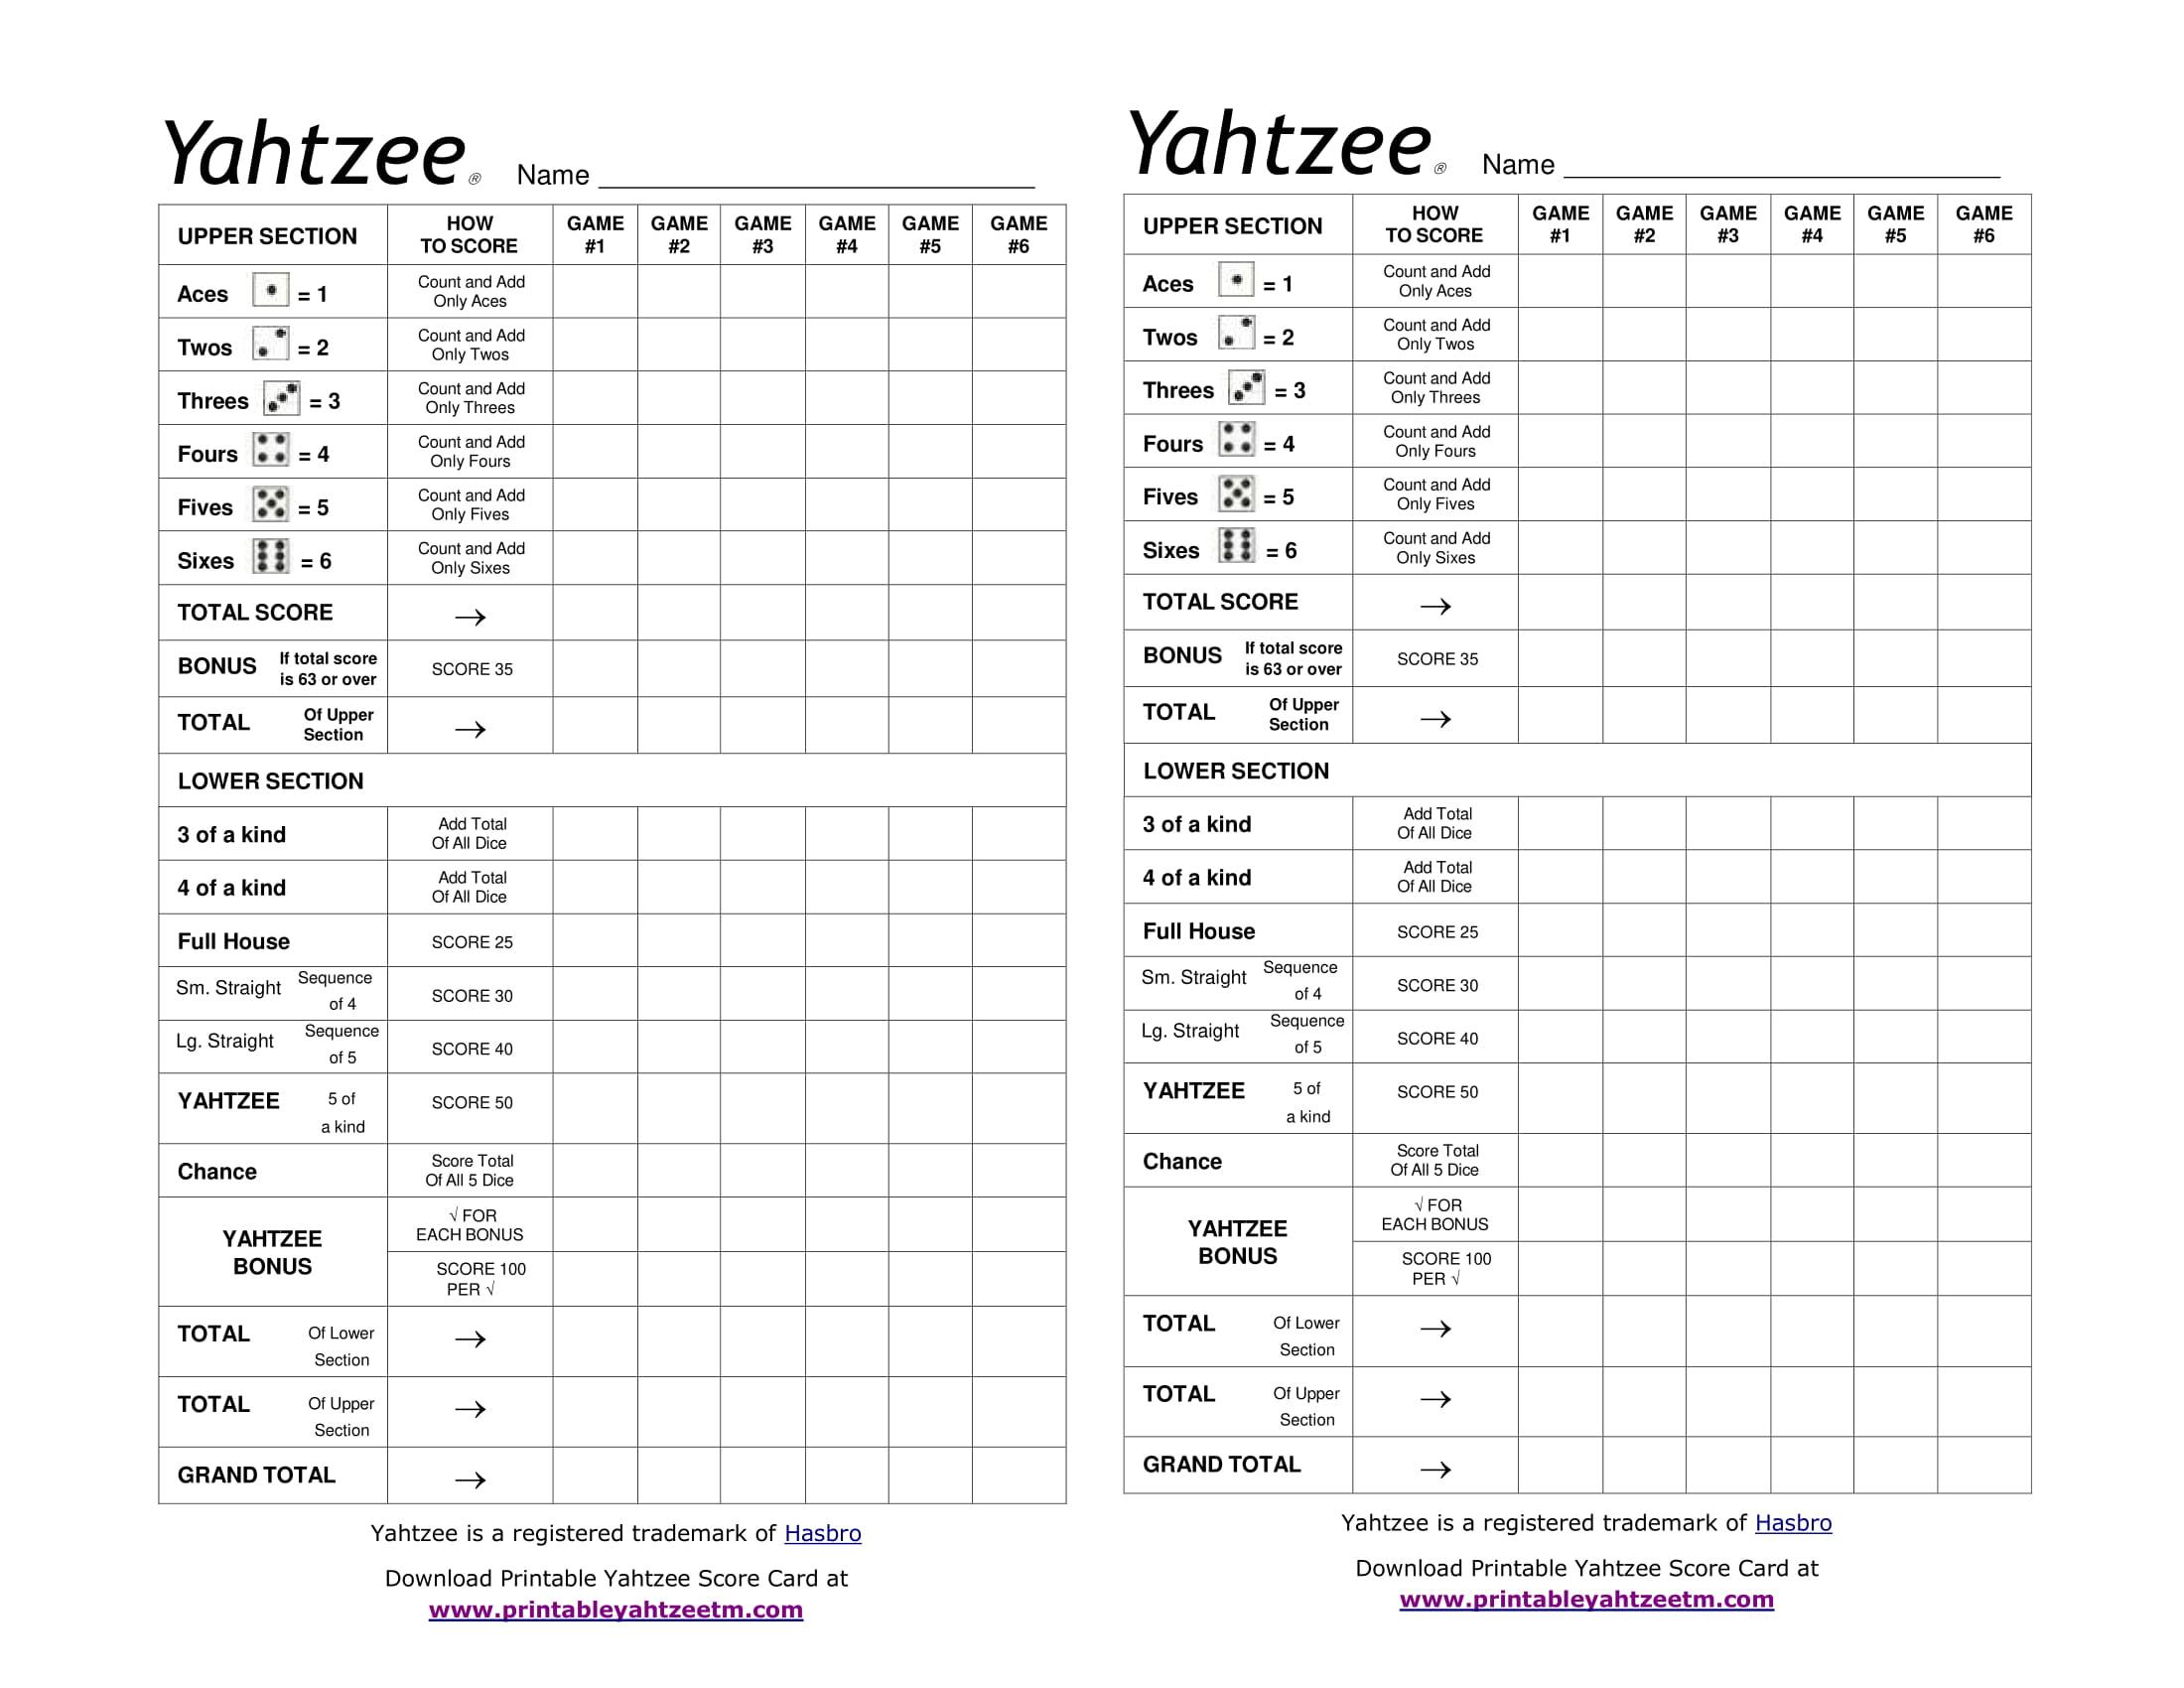 Printable Yahtzee Score Card-1